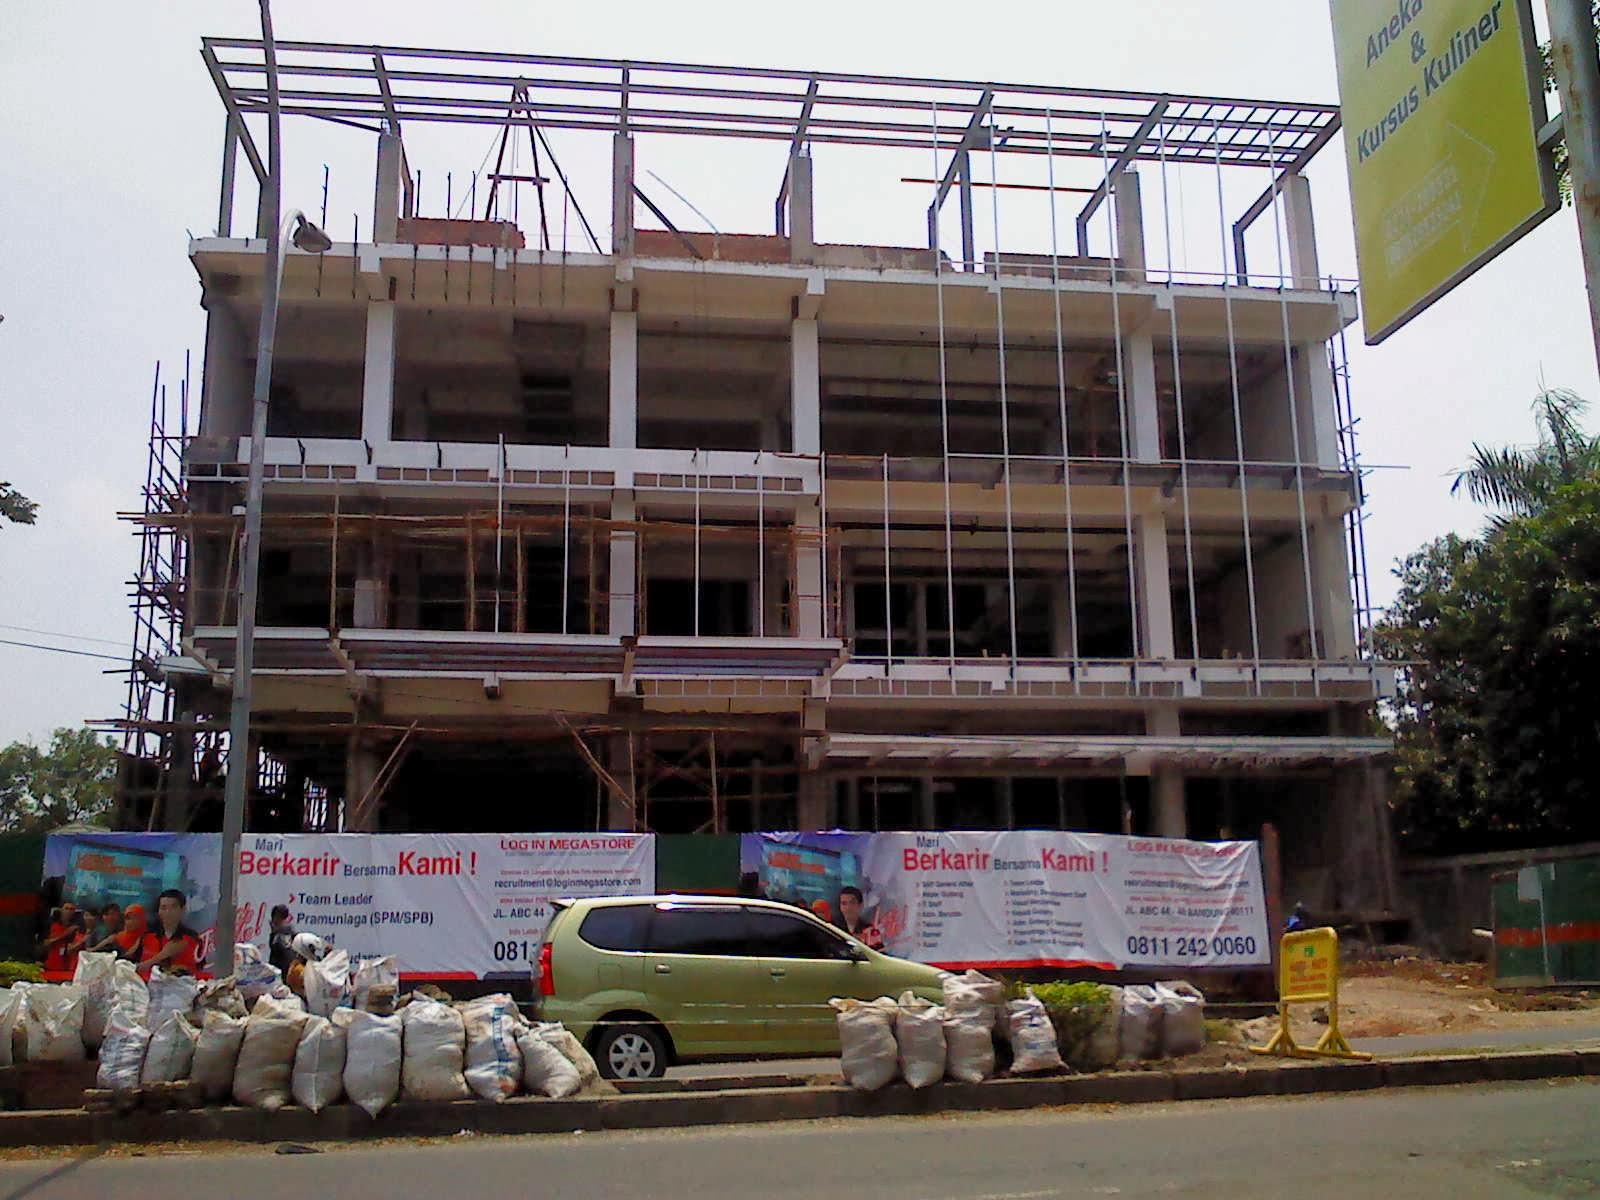 Pembangunan Login Megastore Jl.Dr.Cipto-Kota Cirebon , 15 Februari 2014